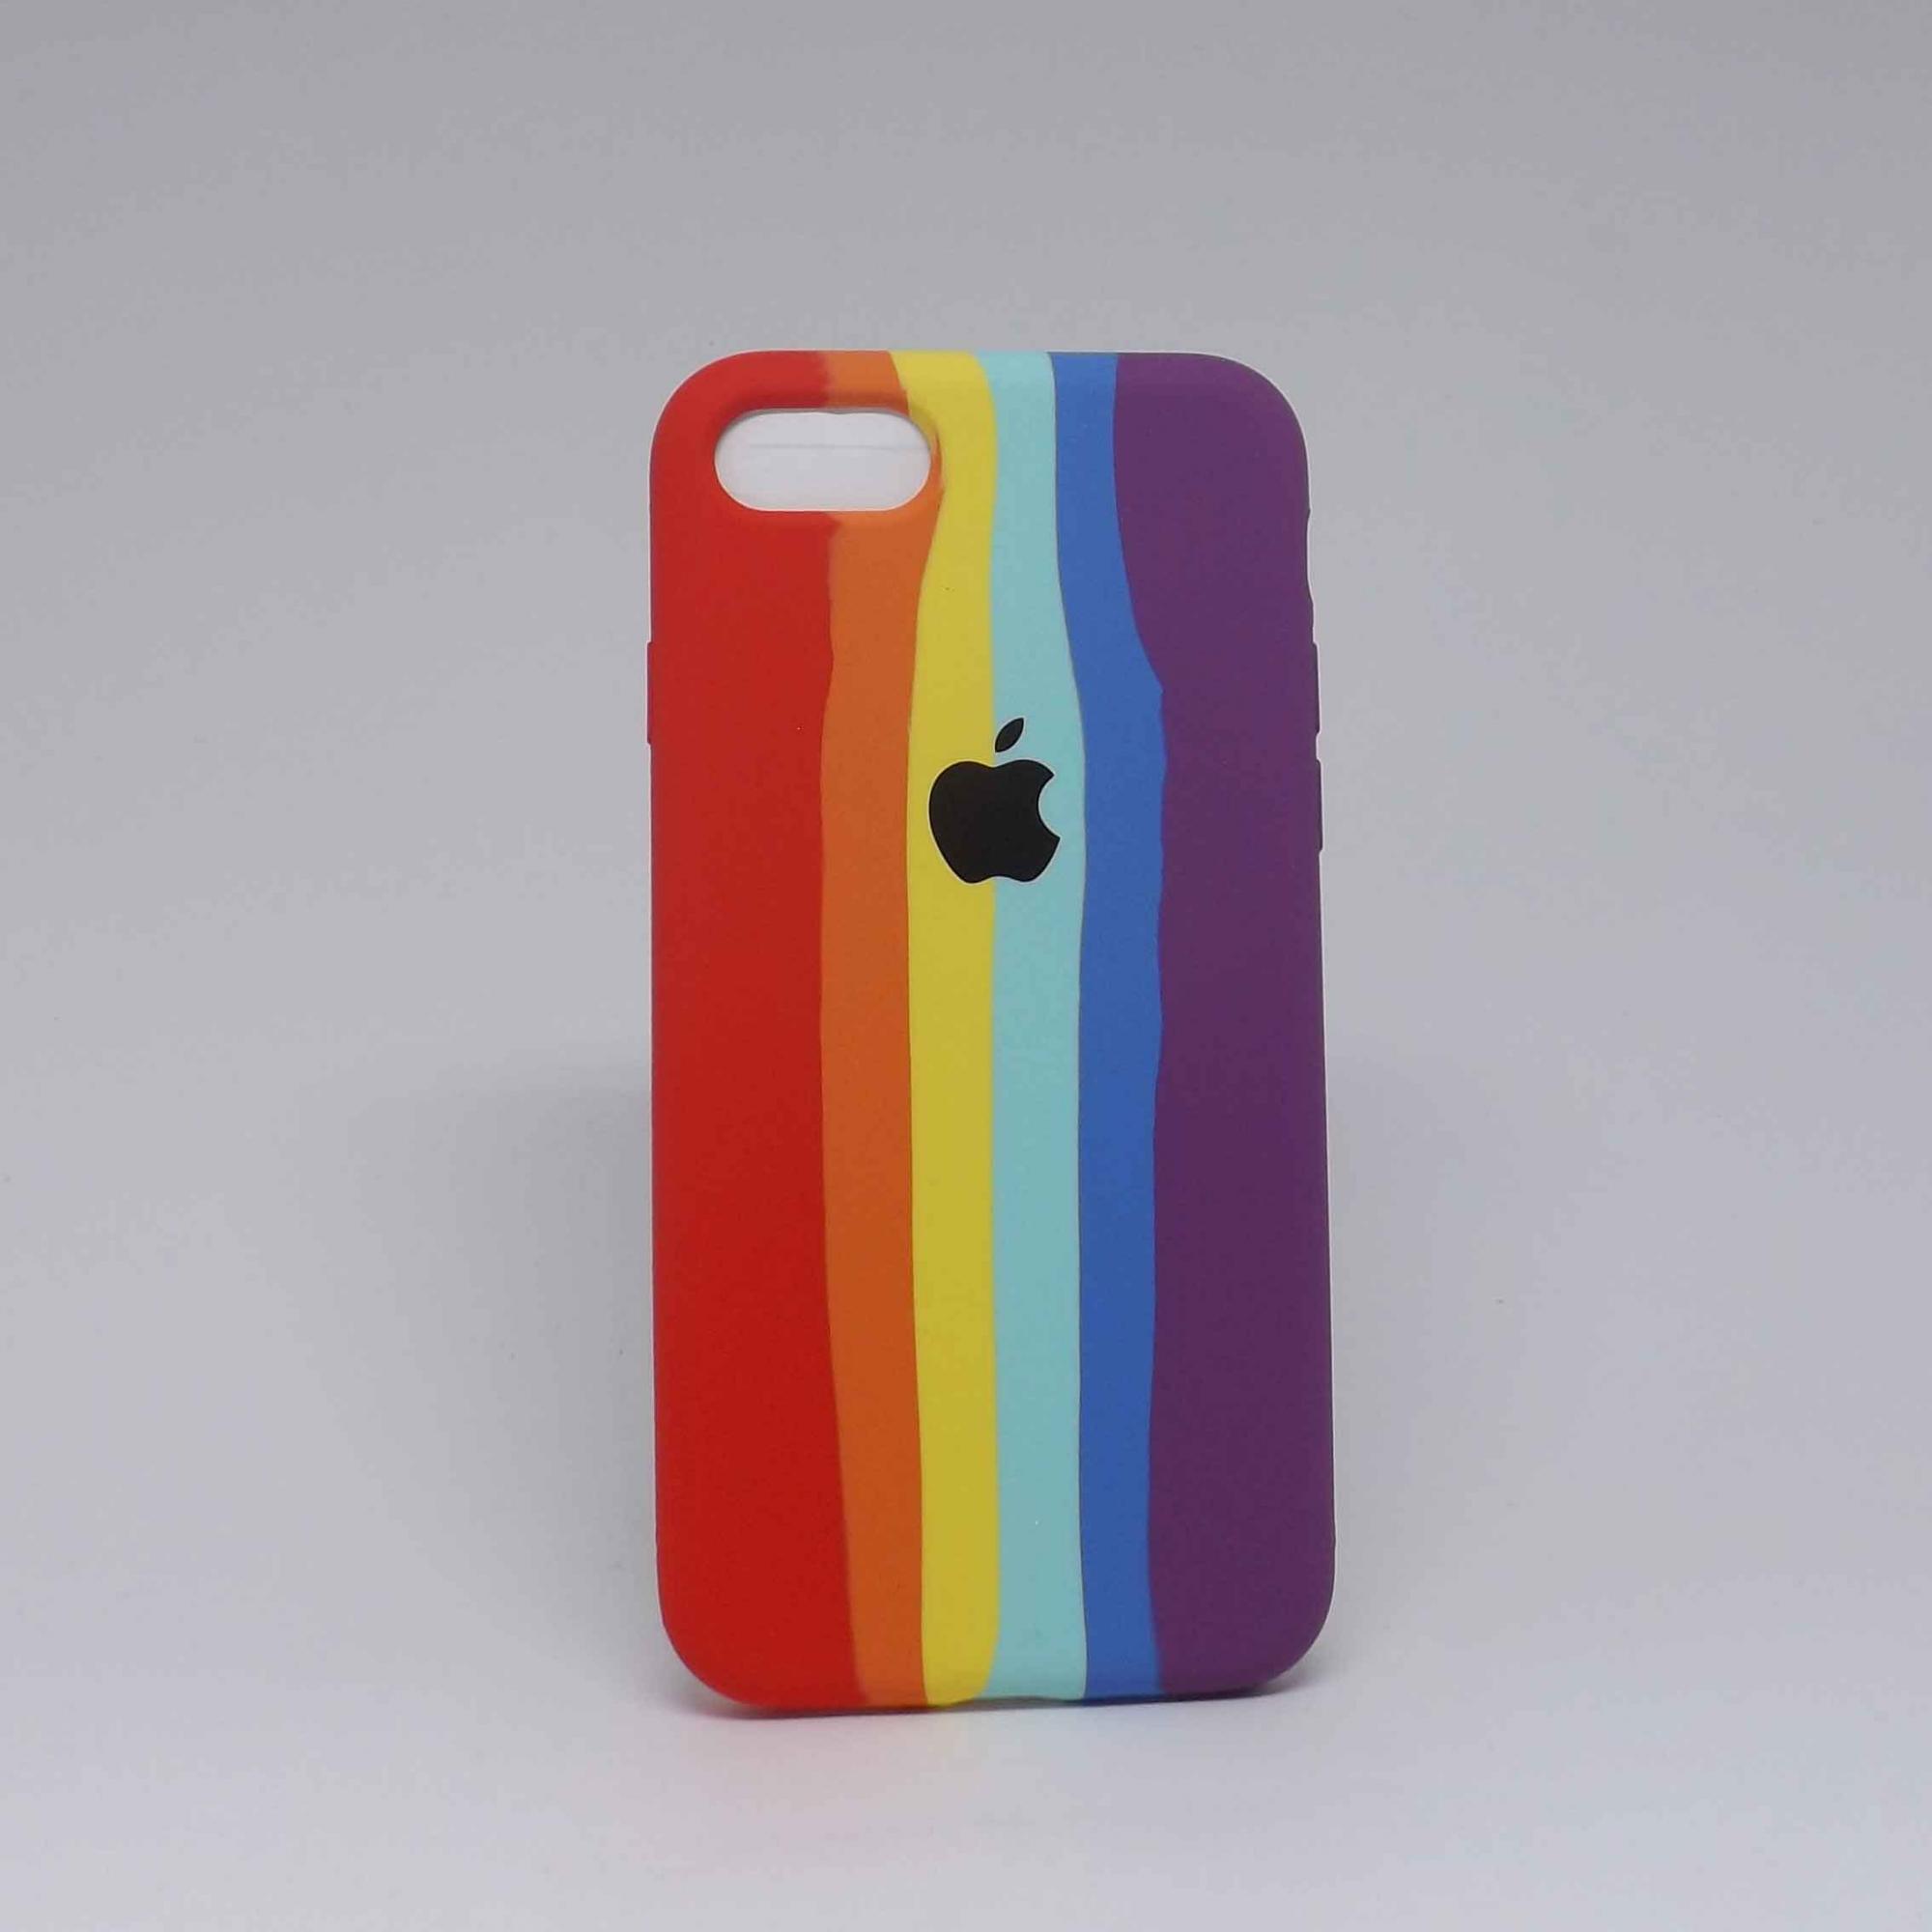 Capa iPhone 7/8 Autêntica Arco-Íris